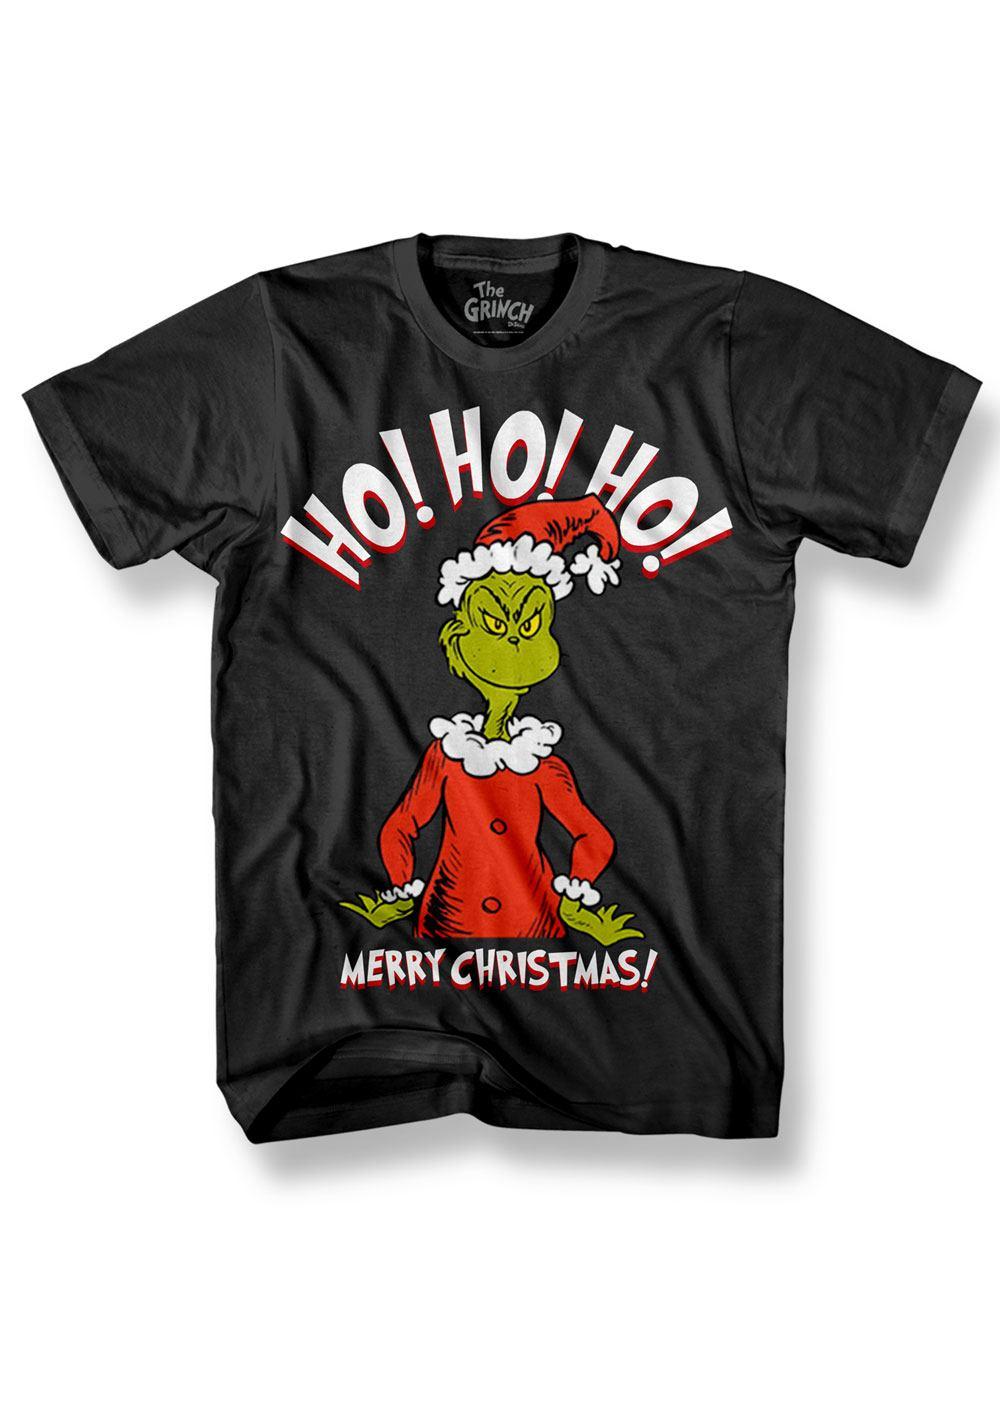 Grinch T-Shirt HO HO HO! Size XL